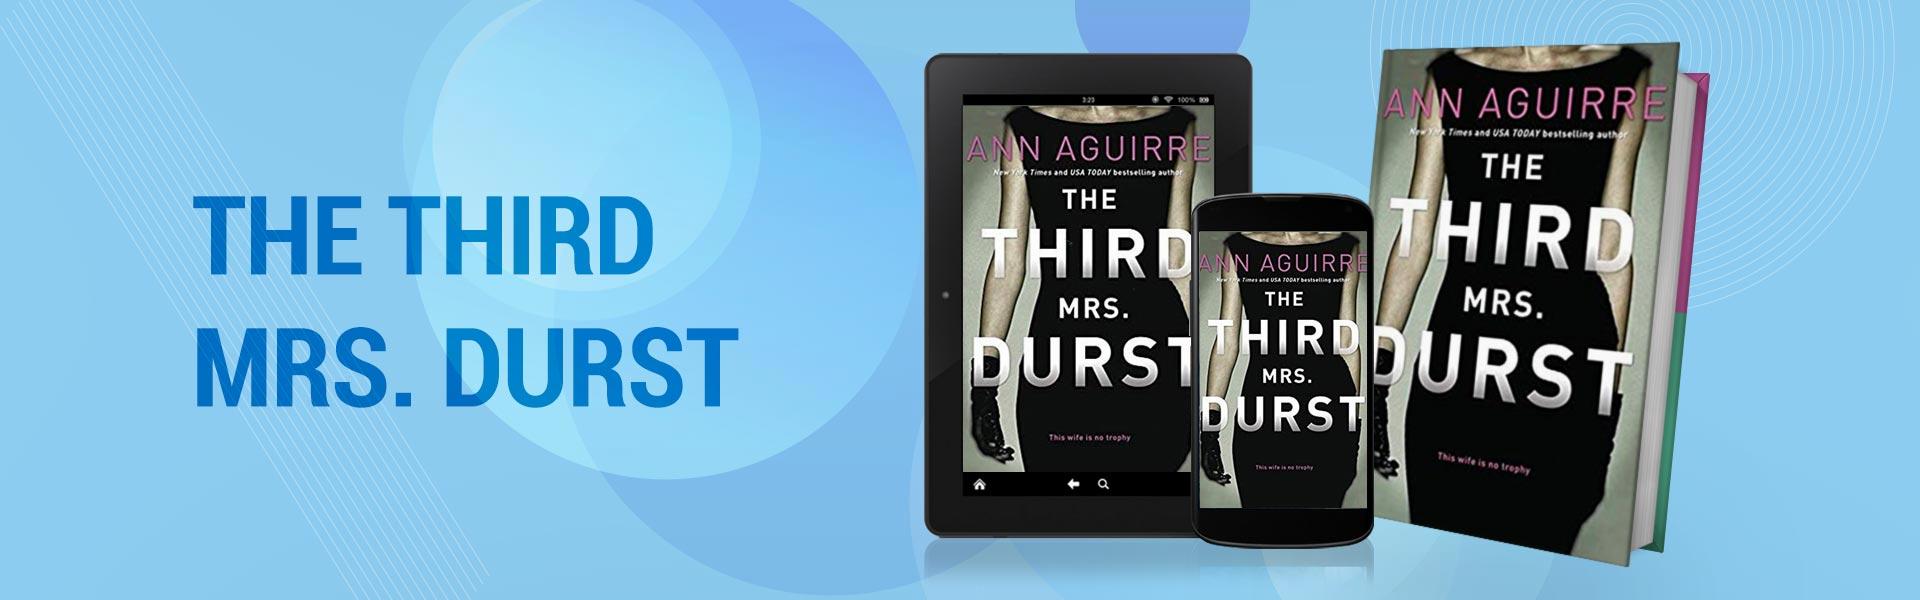 THE-THIRD-MRS-DURST